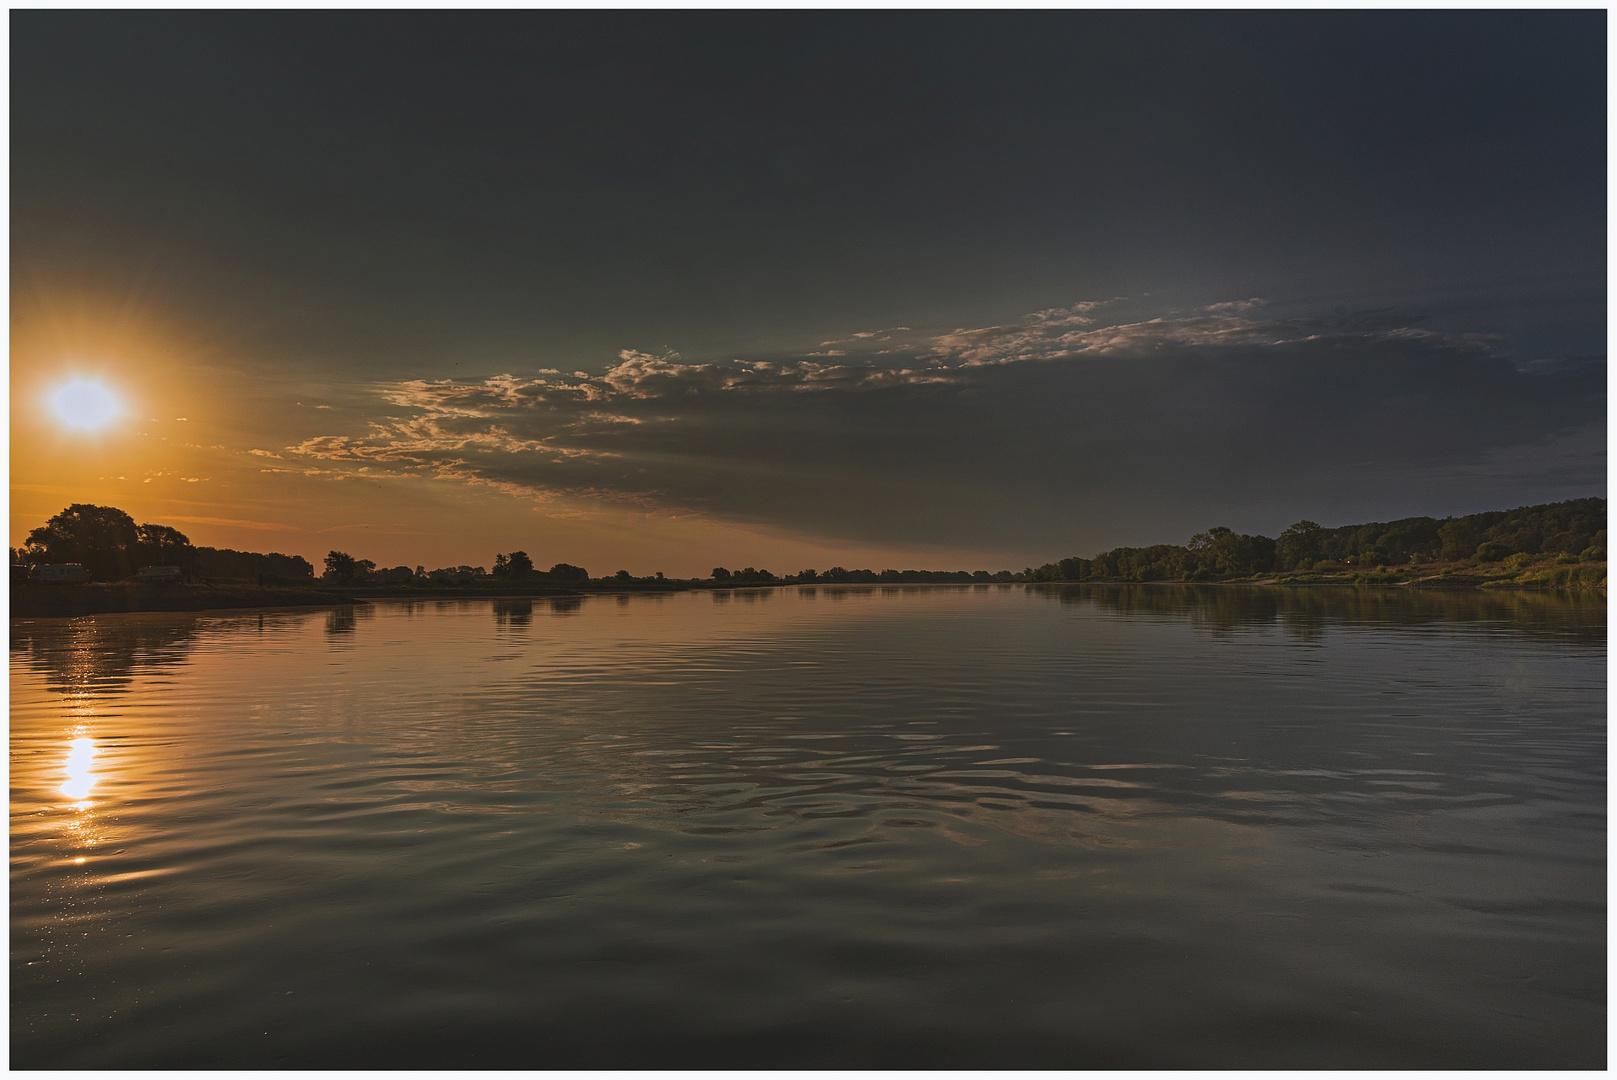 Morgenrot an der Elbe